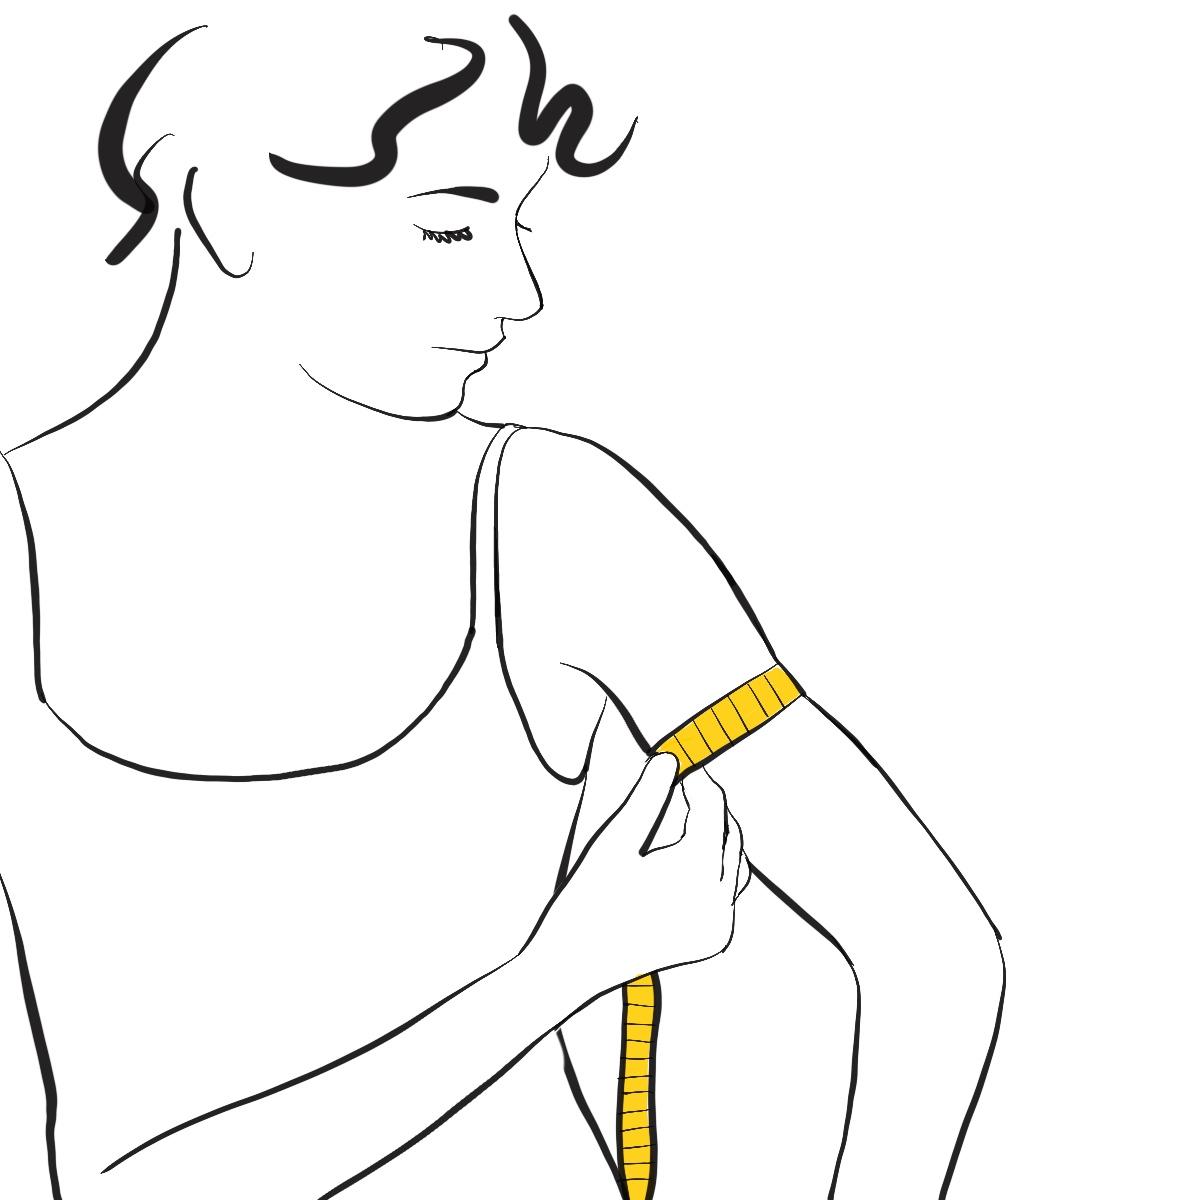 Longueur-bras.jpg